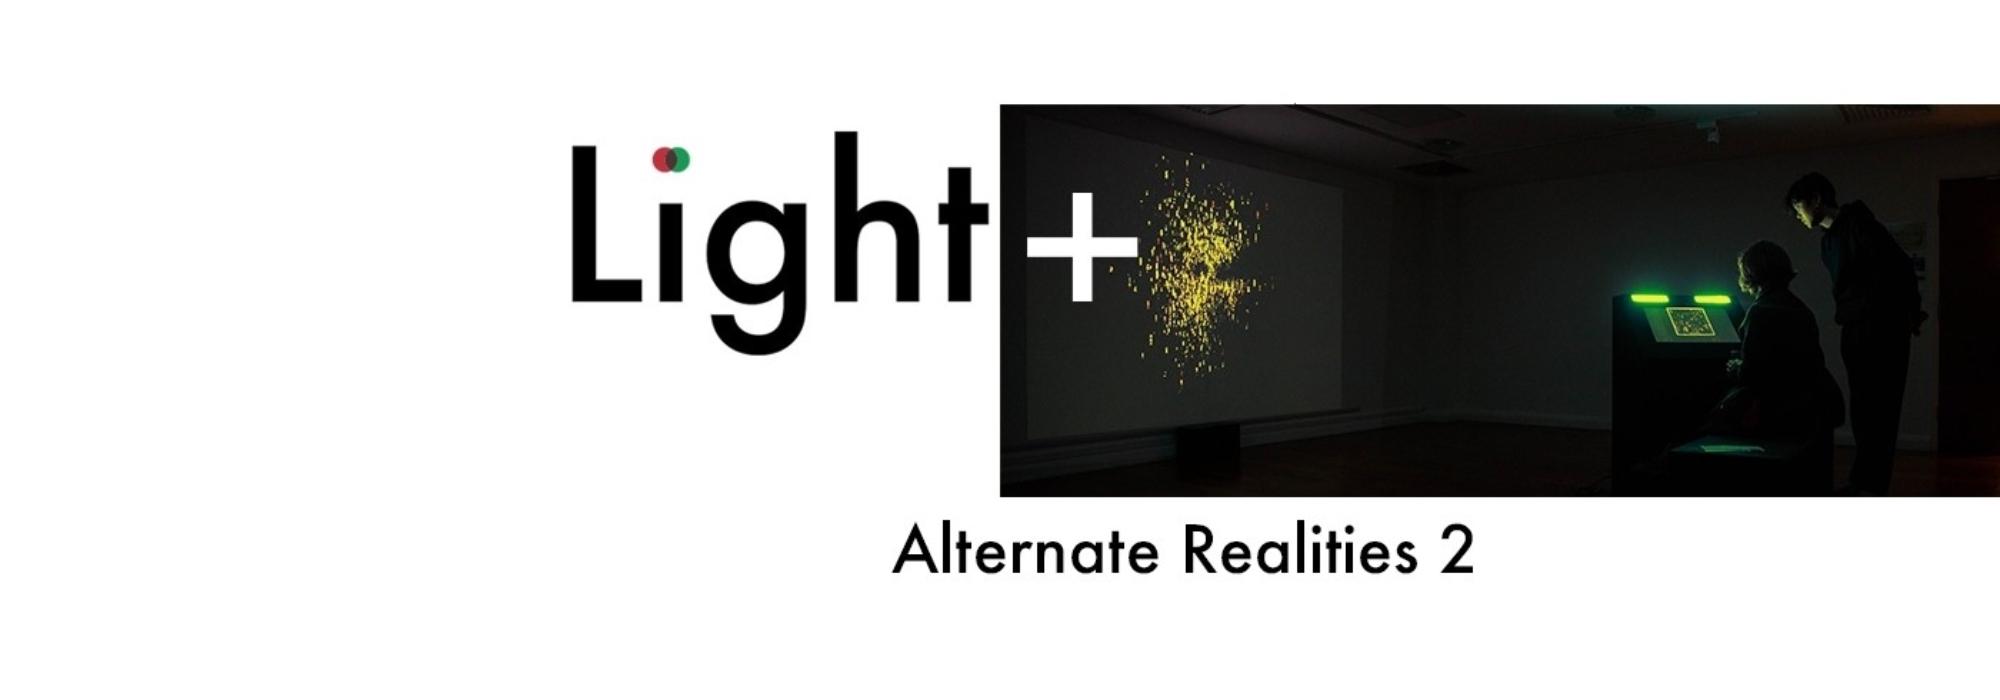 Light+ Alternate Realities 2